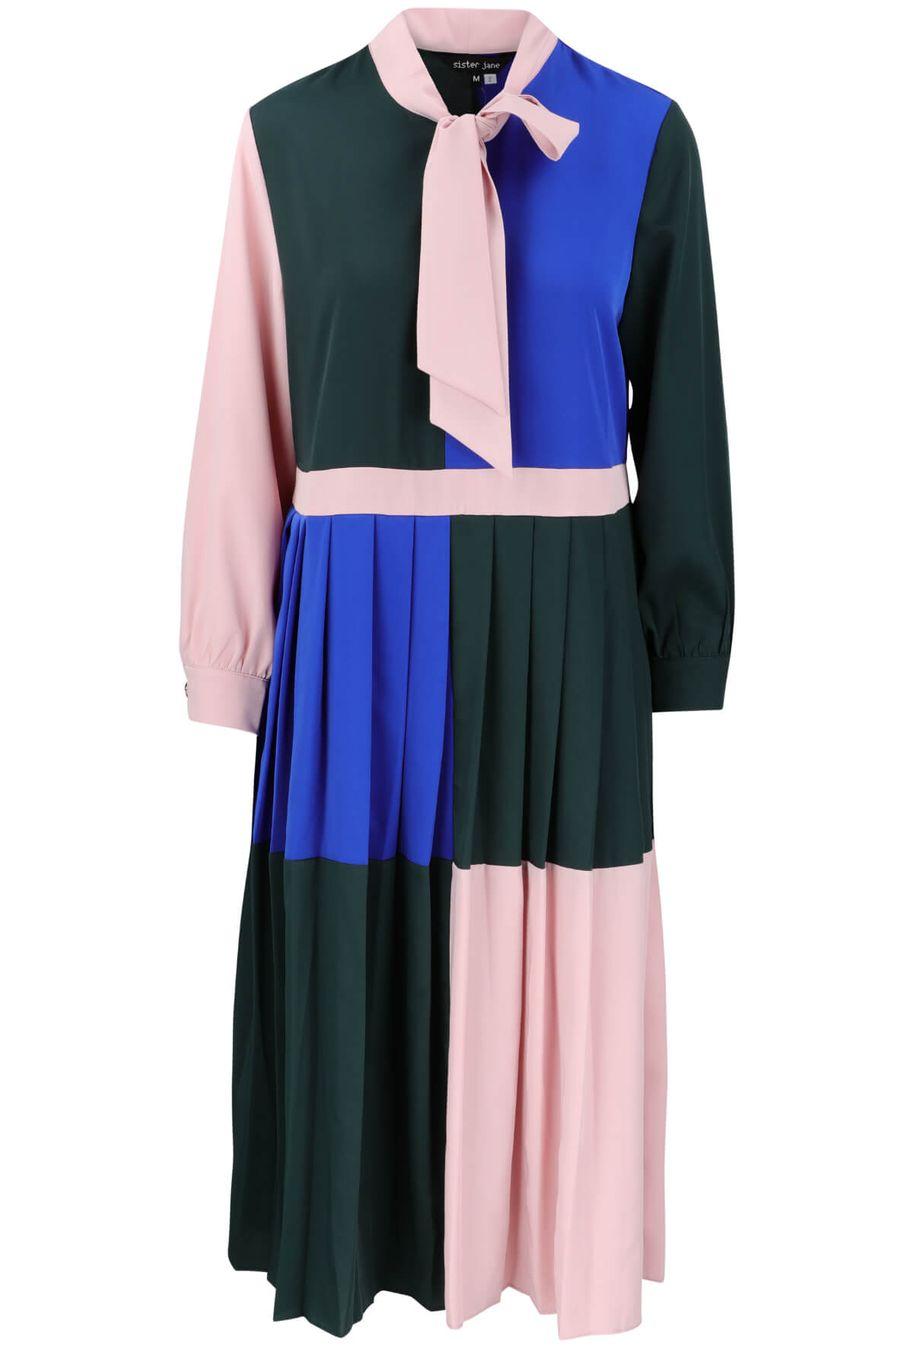 sister-jane-bashful-colourblock-dress-1